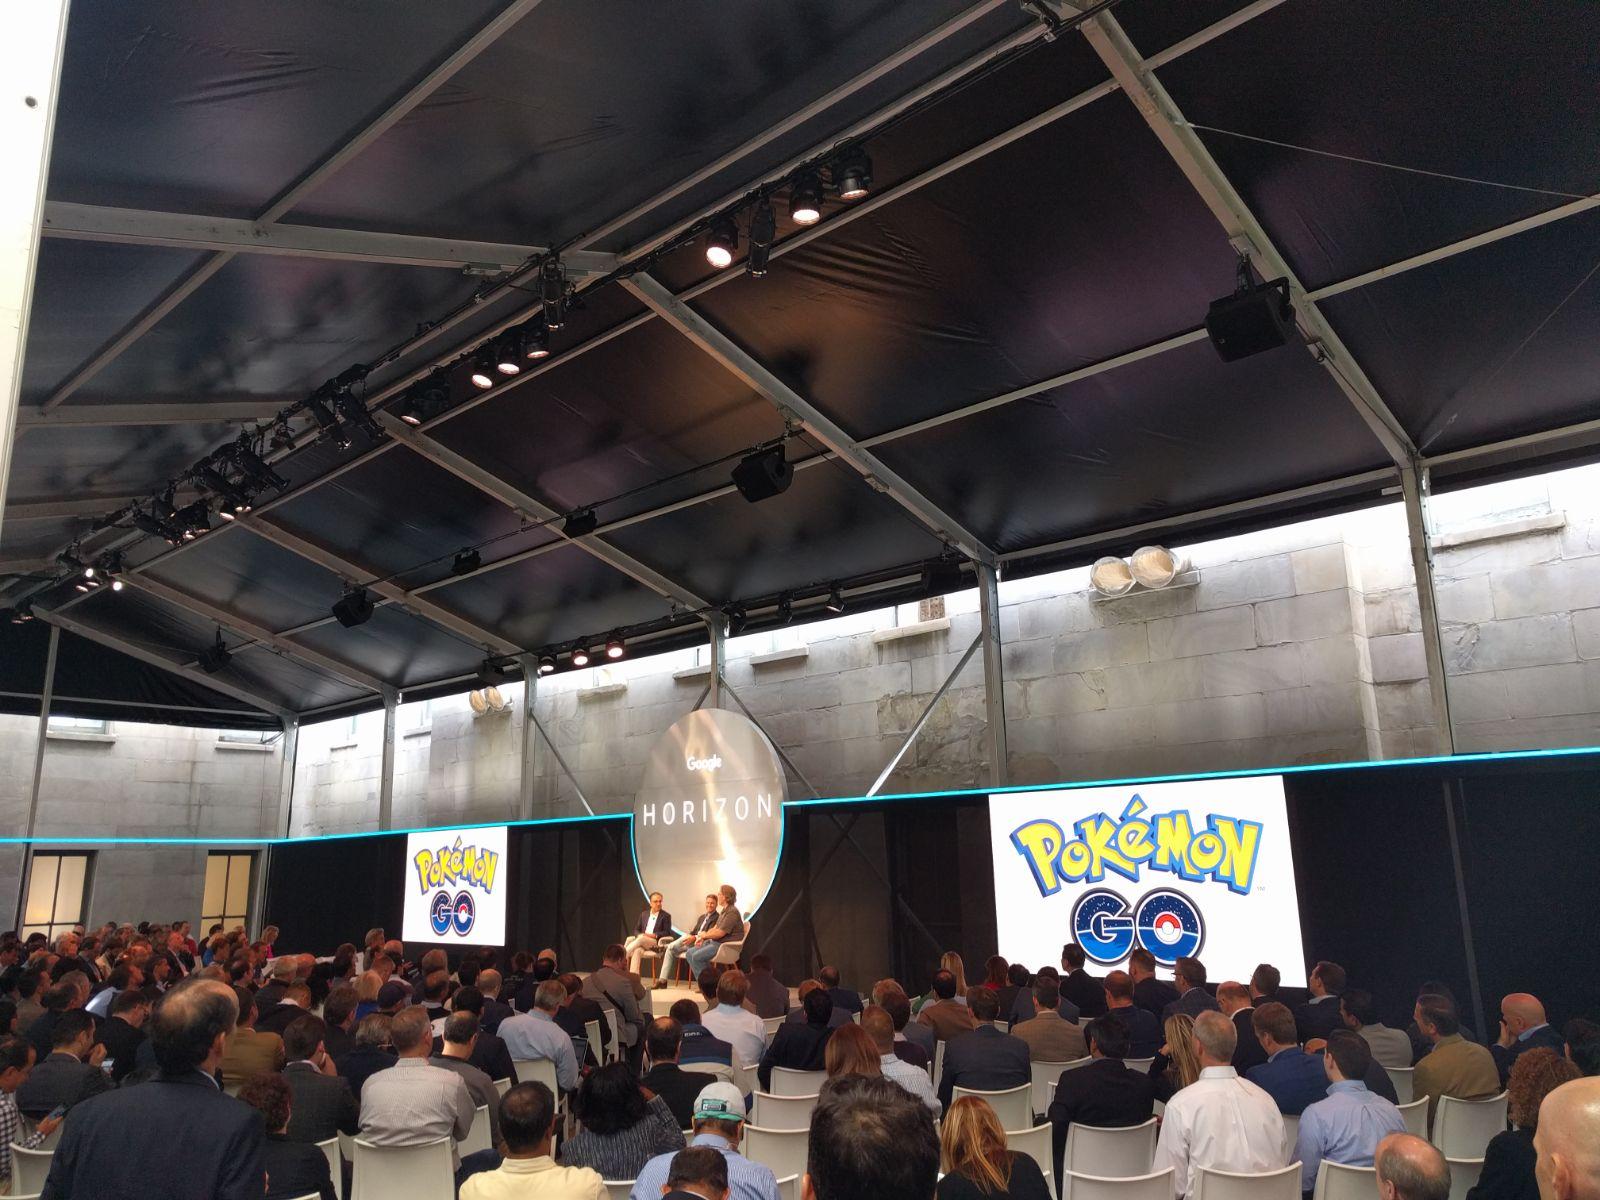 Google Horizon conference about Pokemon Go